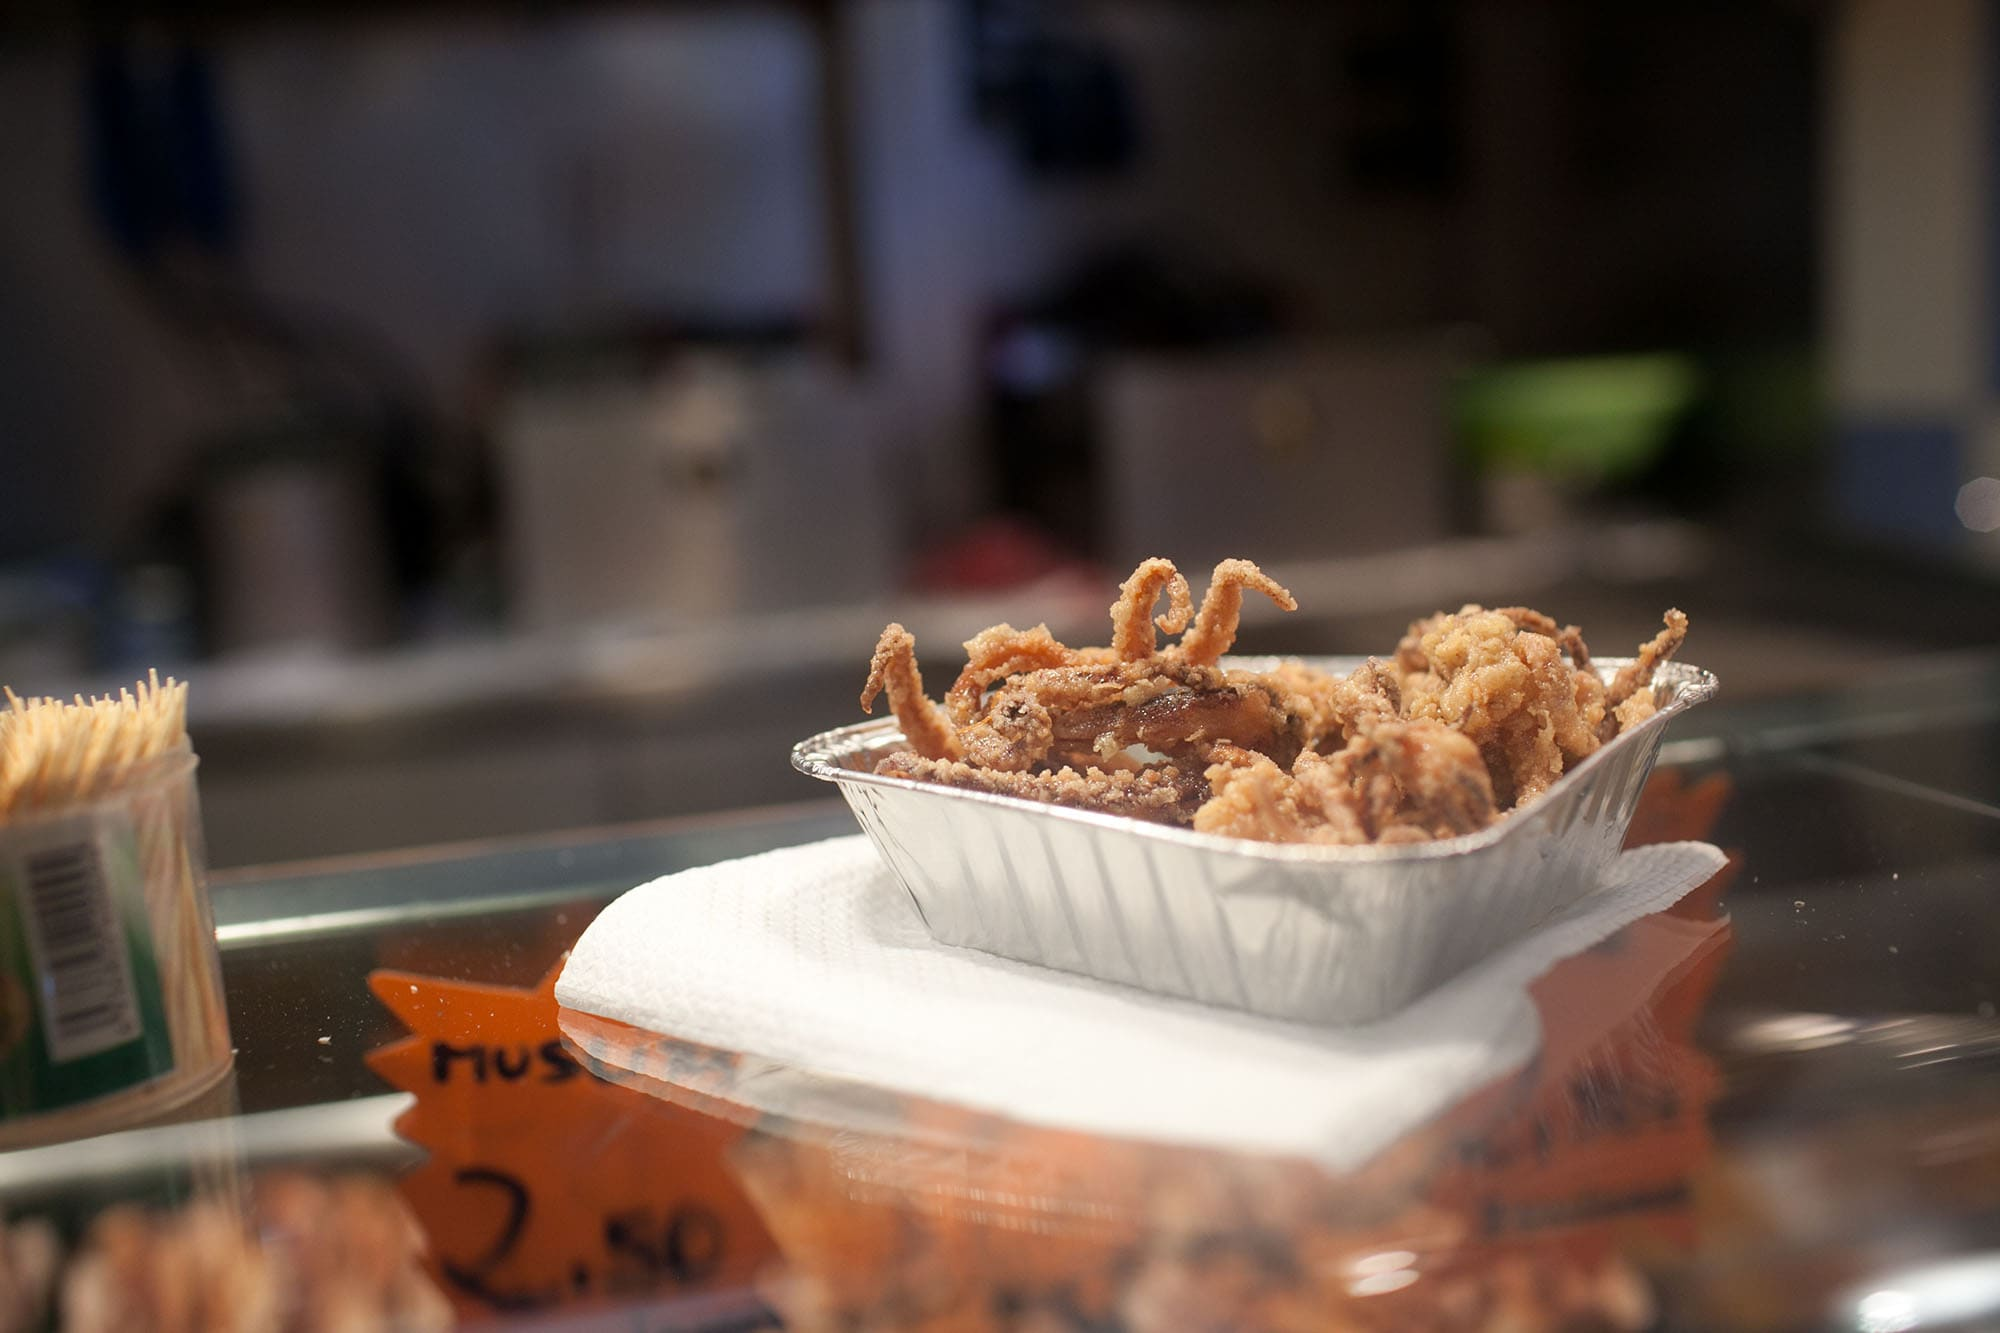 Fried squid from Mercat de Sant Josep de La Boqueria in Barcelona, Spain.